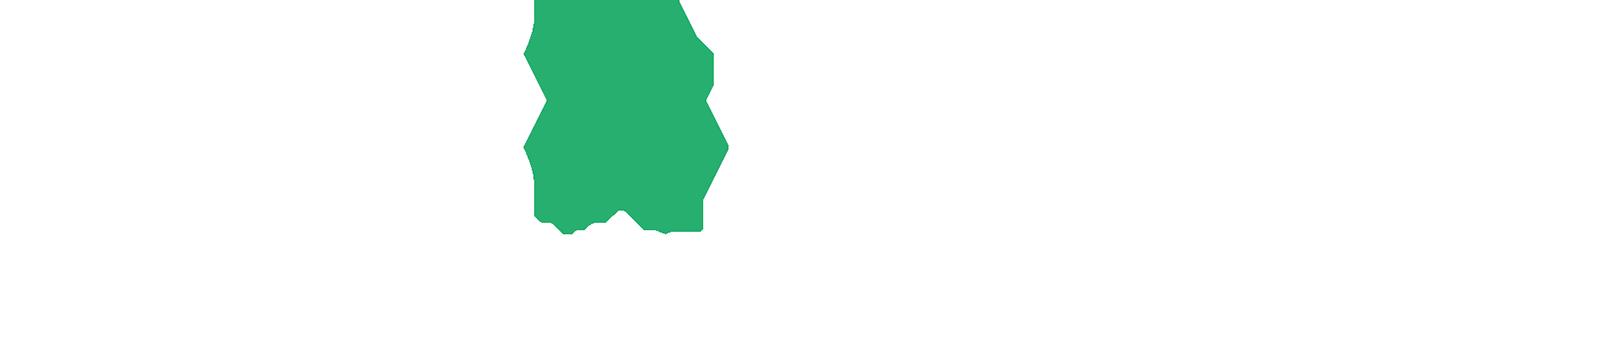 400×TOKYO 東京発・400字からはじまる、世界を変えるスタートアップコンテスト。